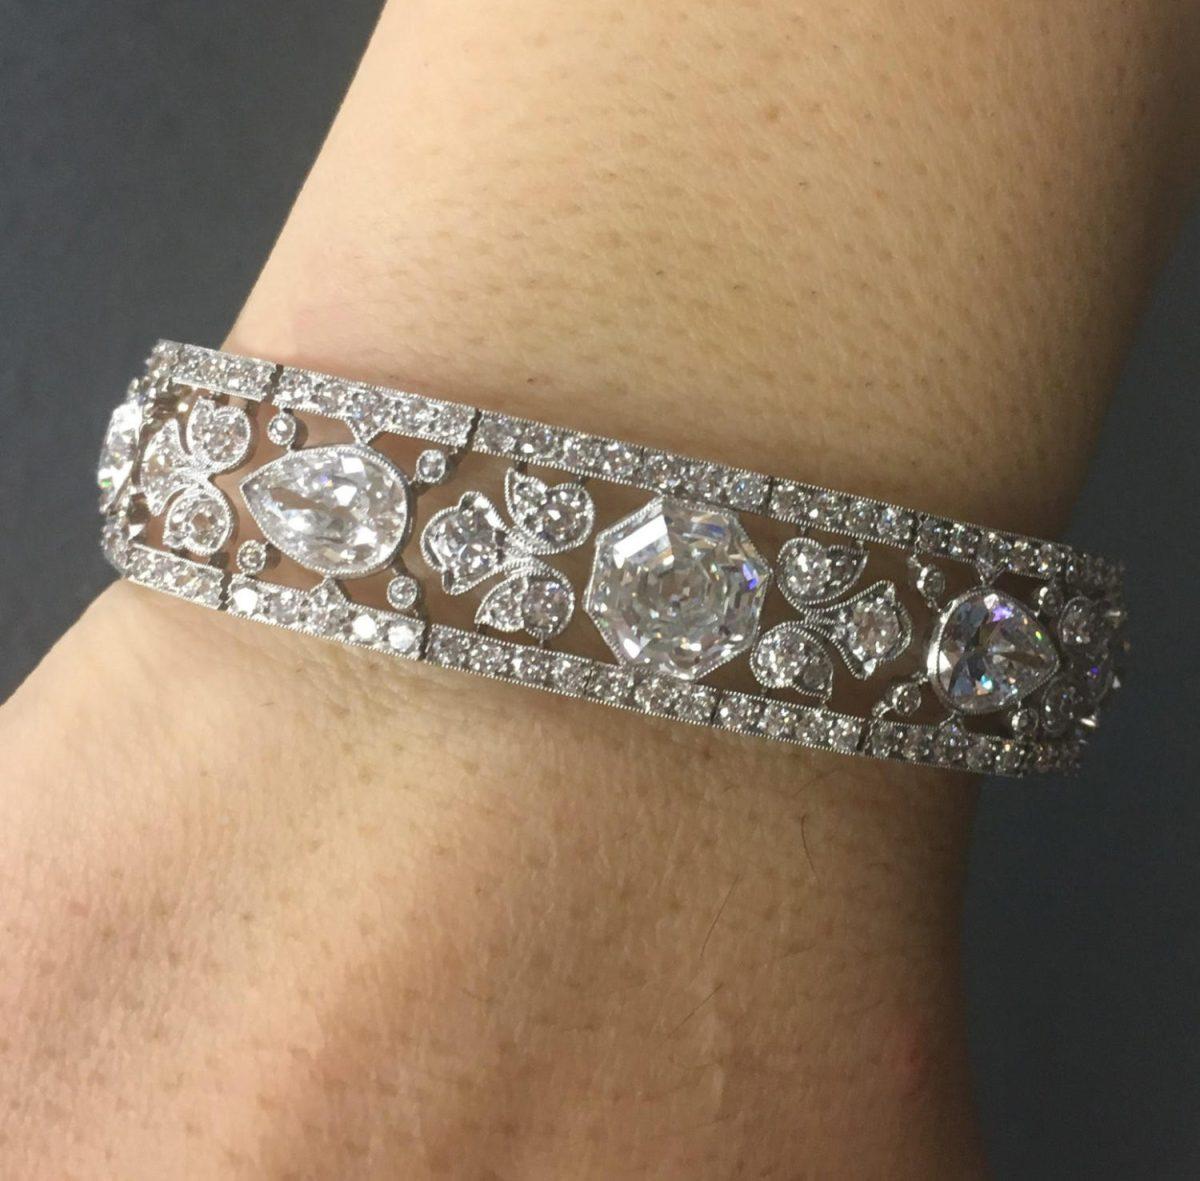 Edwardian Diamond Bracelet Price Realized: $137,500 Brokered through Bonhams, by Fine Estate, Inc.